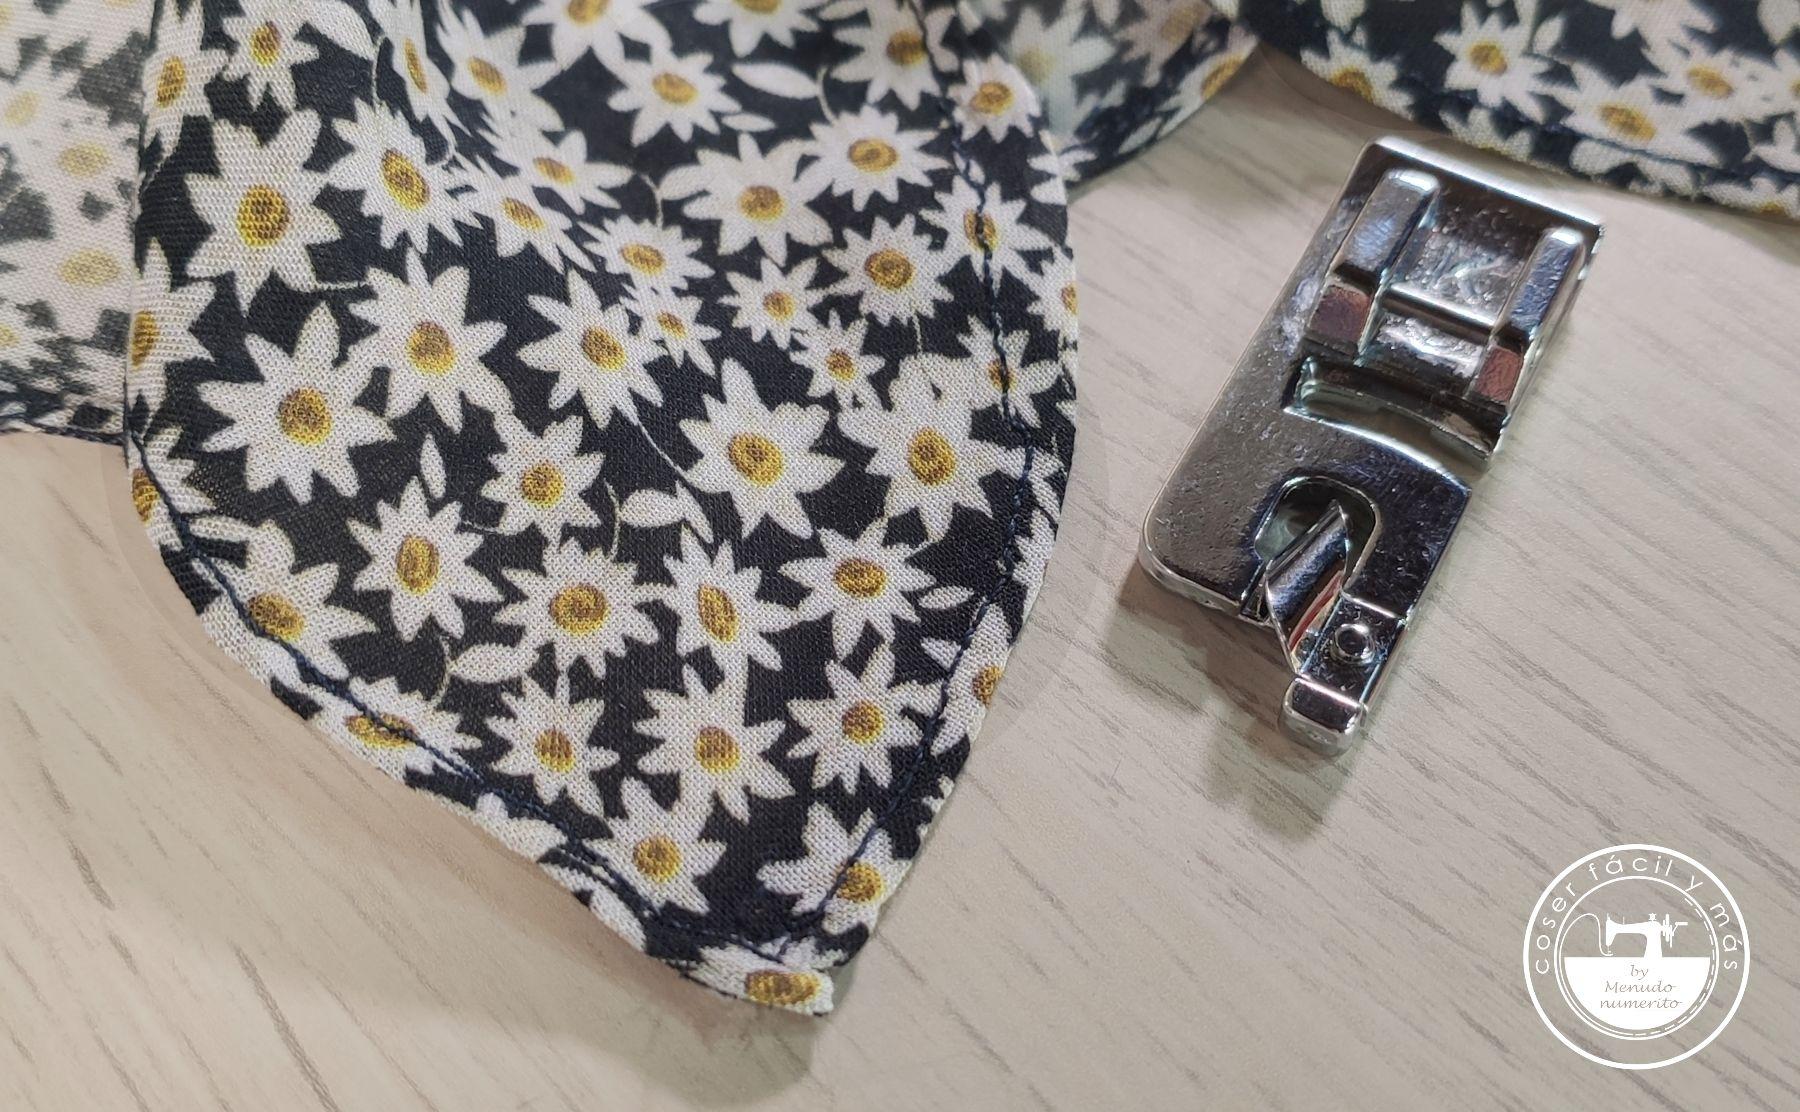 prensatelas dobladillos menudo numerito blog de costura